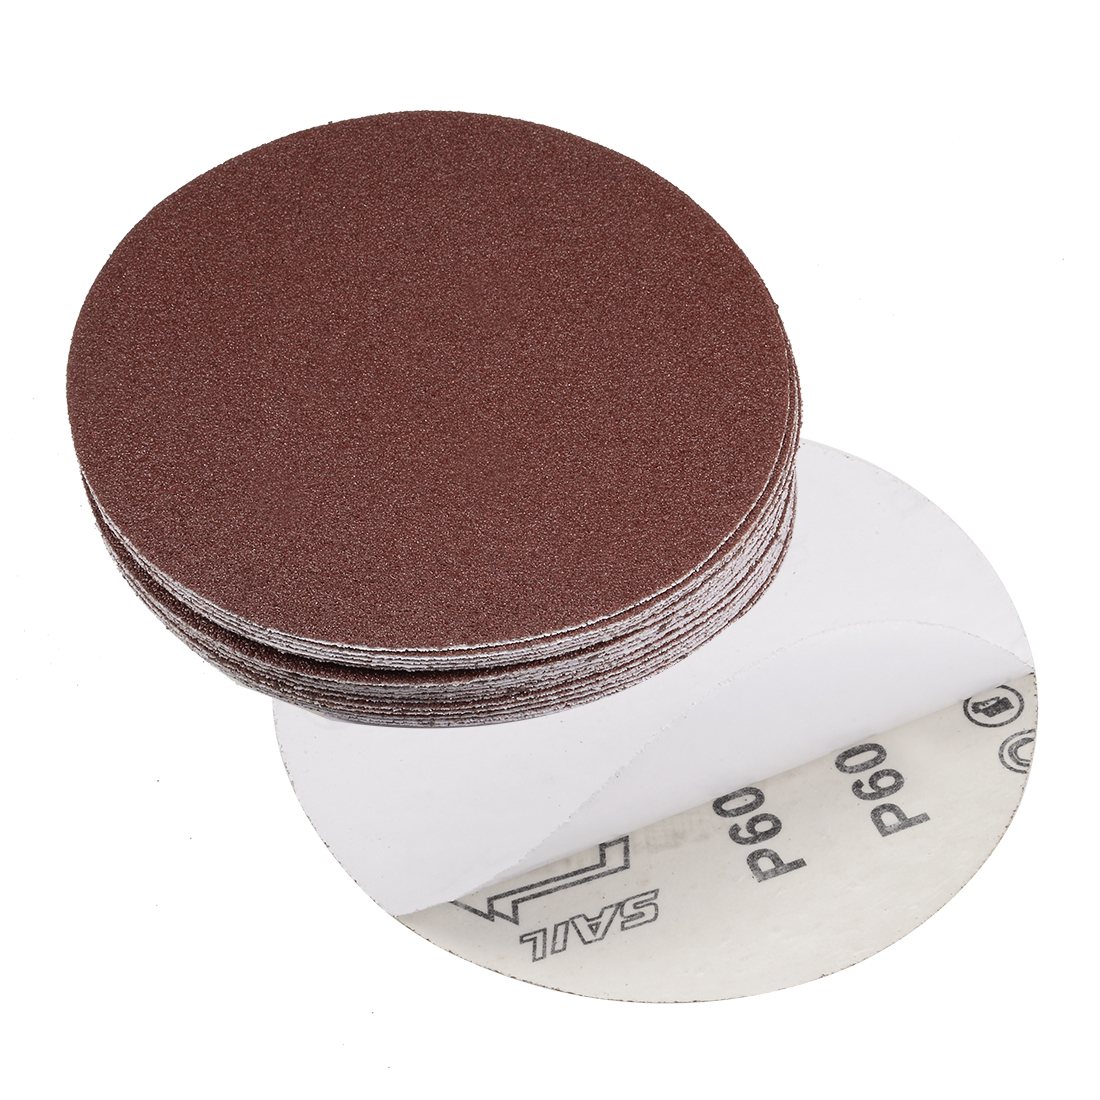 6-inch 60-Grits PSA Sanding Disc, Adhesive-Backed for Orbital Sander 20pcs